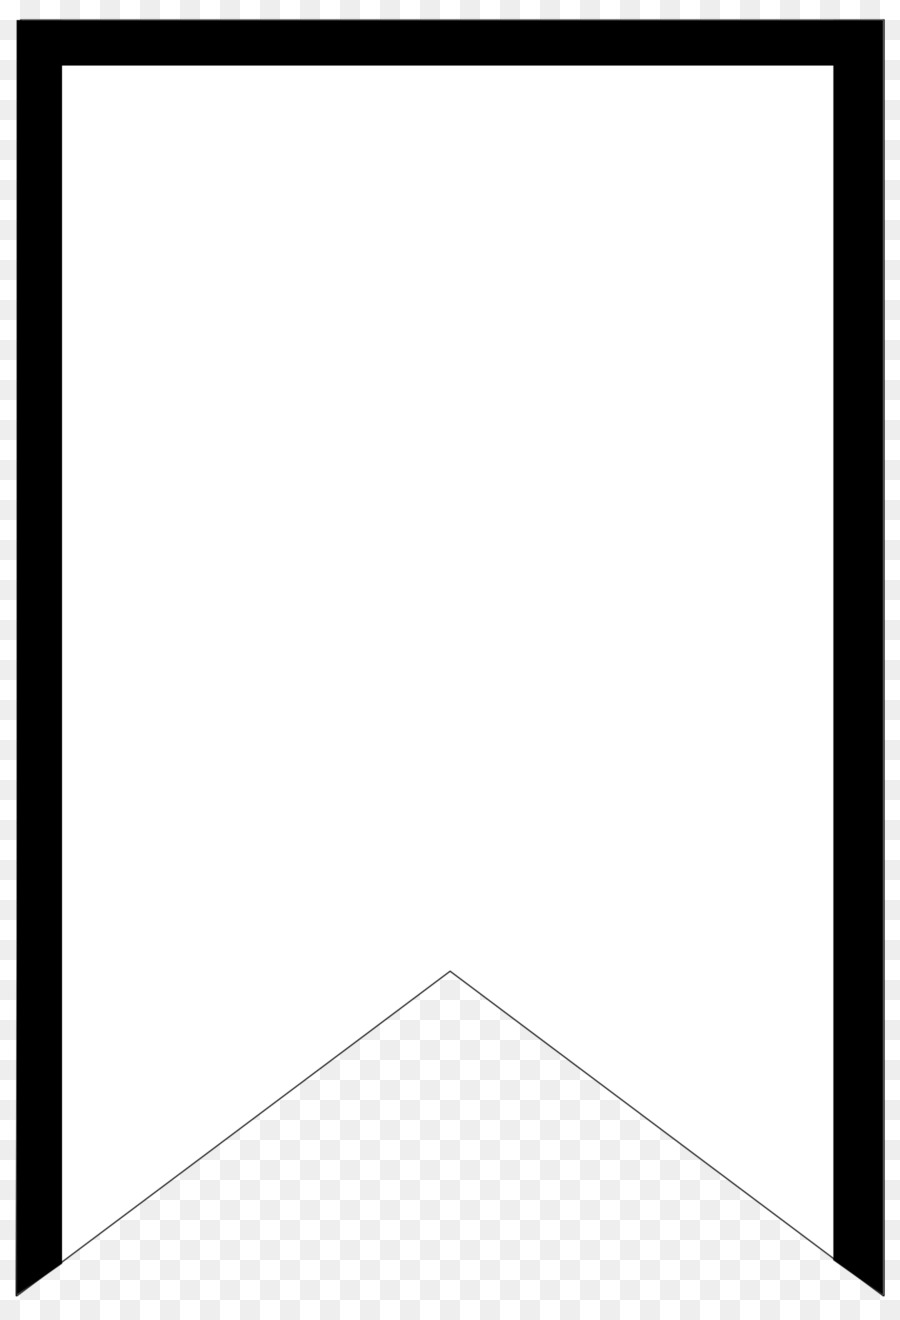 Banner Png Black And White : banner, black, white, Black, White, Frame, Download, 1424*2083, Transparent, Banner, Download., CleanPNG, KissPNG